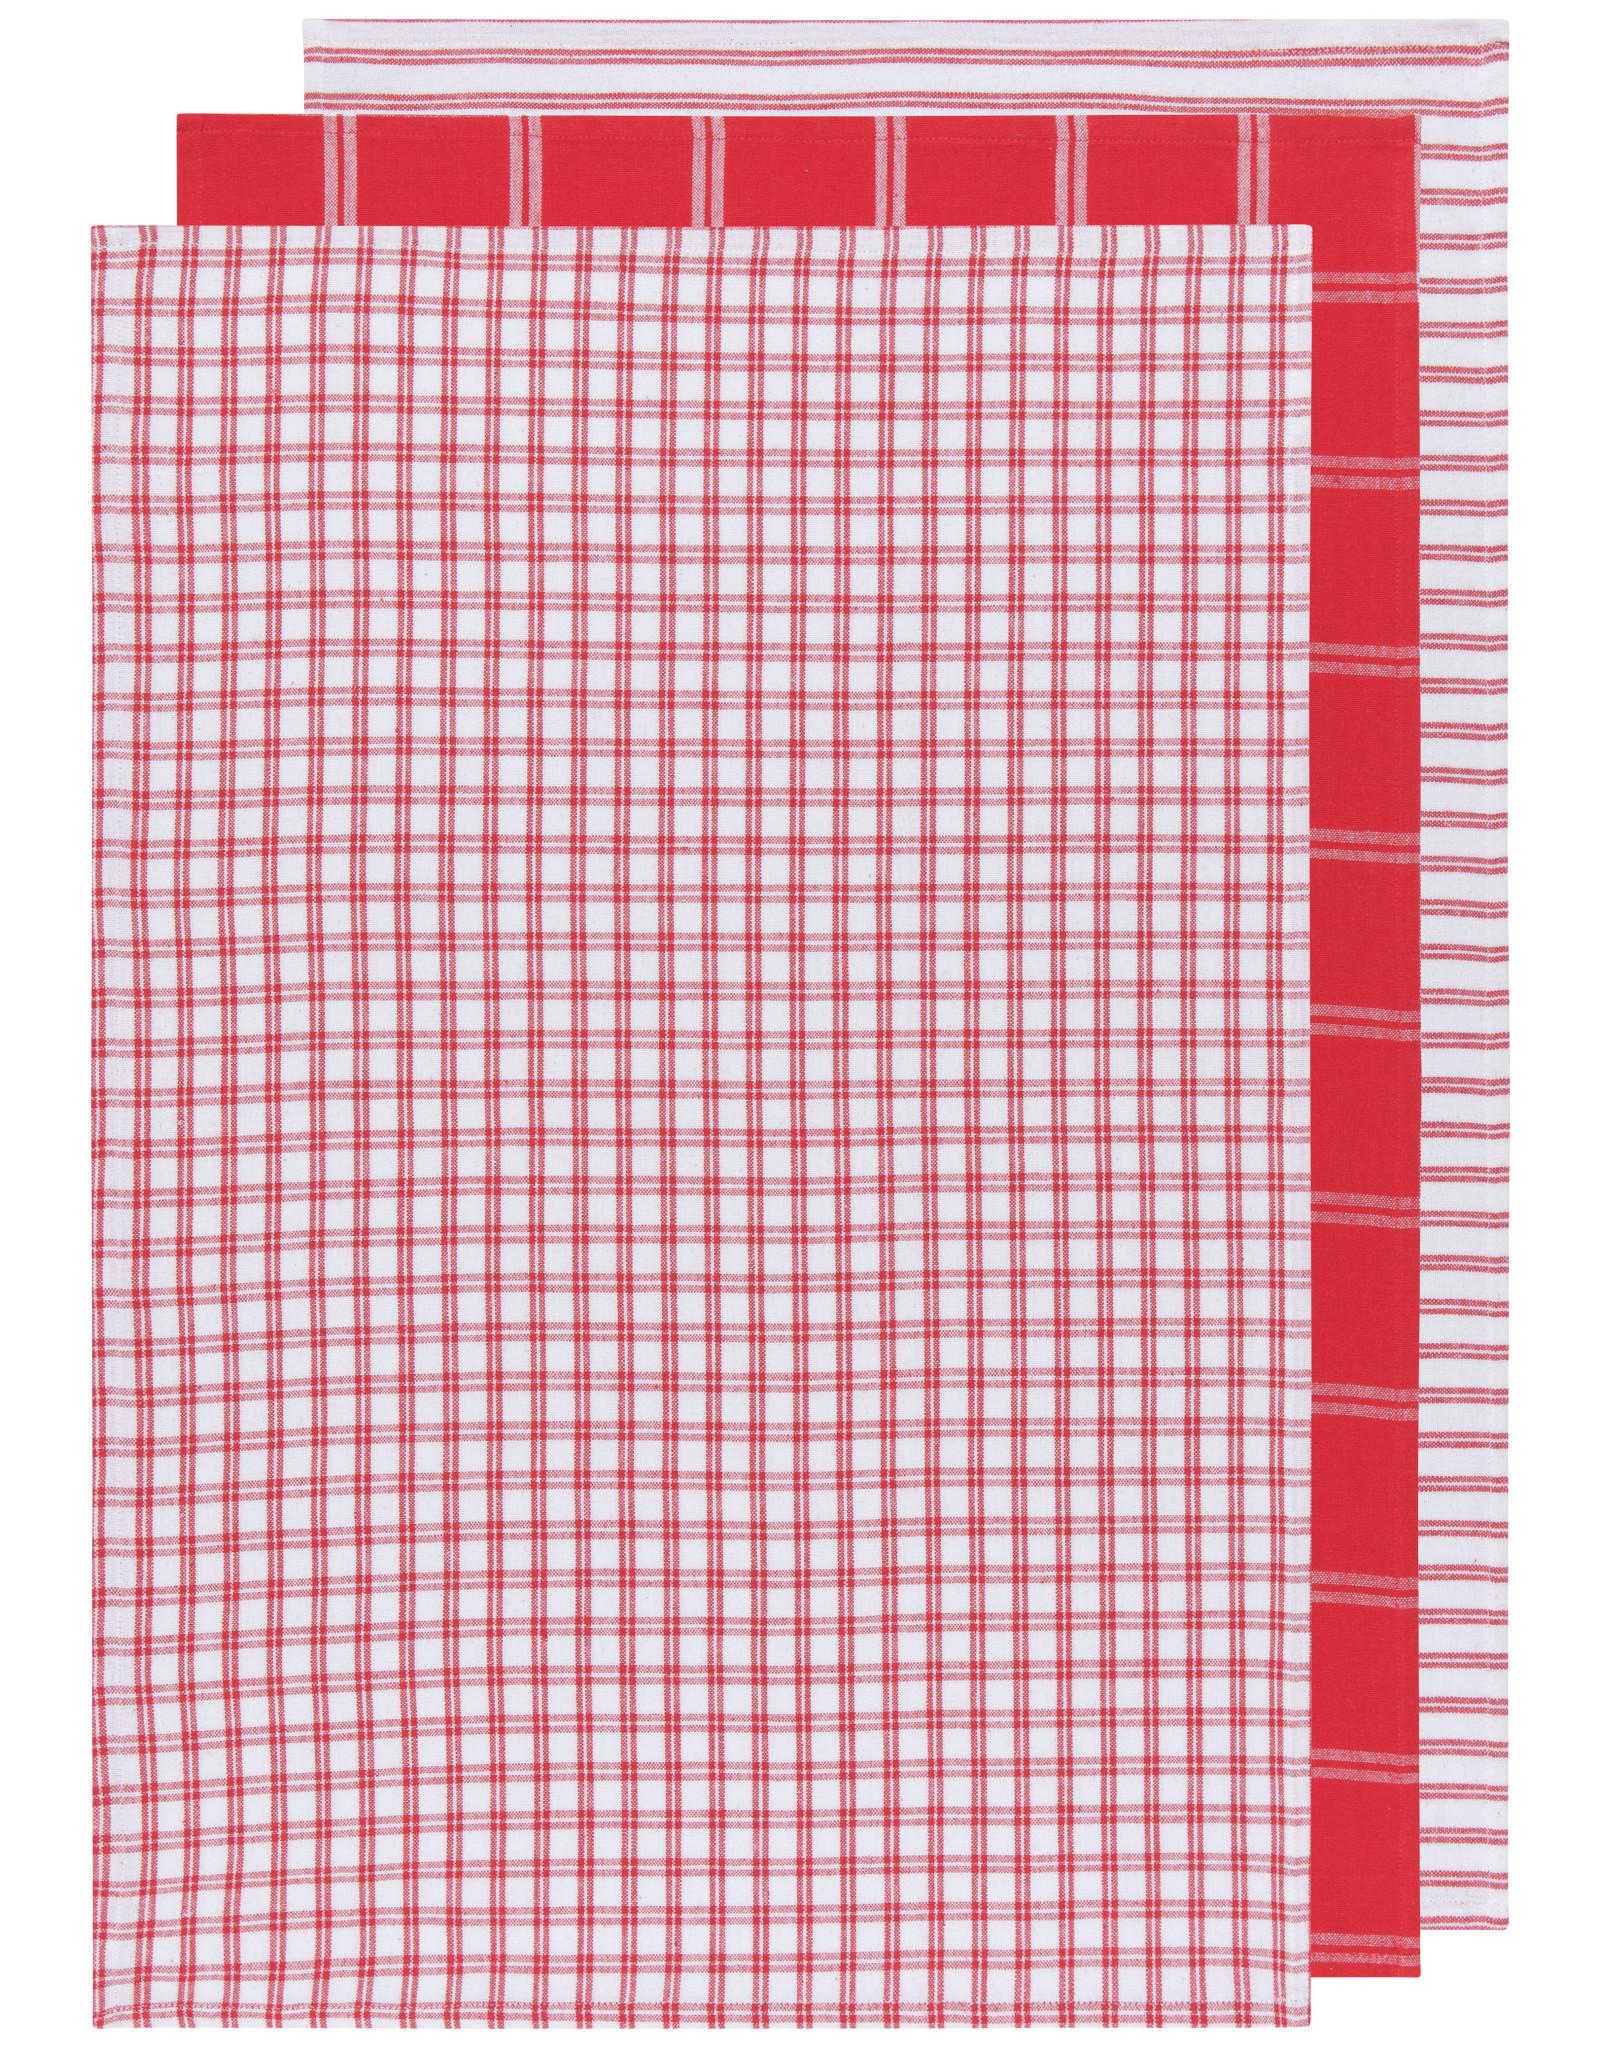 Danica - Tea Towel - Tic Tac Toe Red